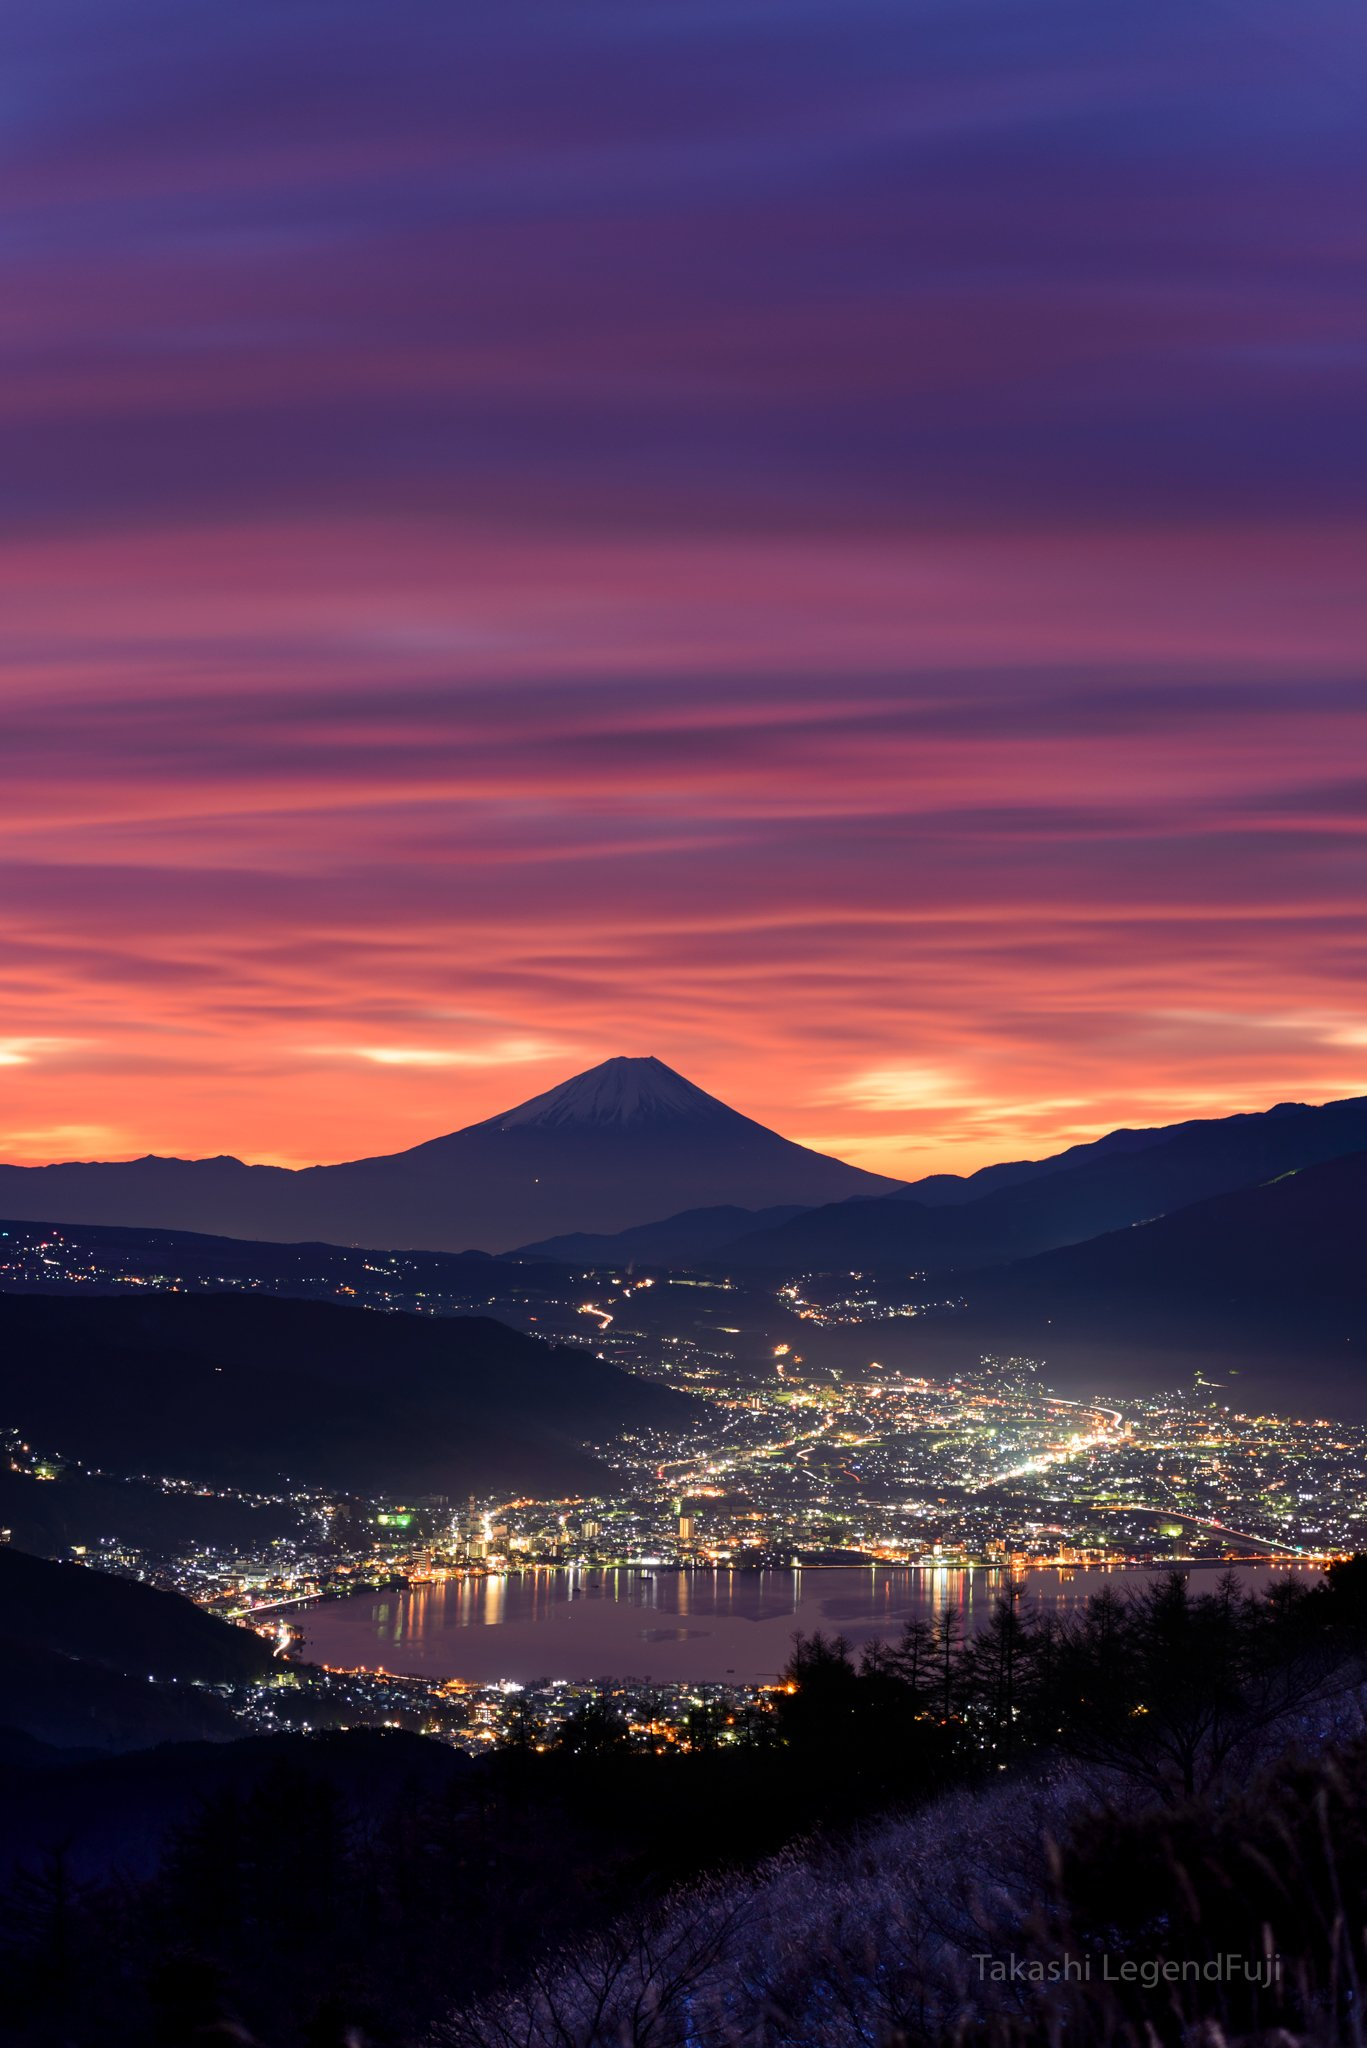 fuji,mountain,japan,sky,red,crimson,cloud,lake,night,light,landscape,amazing,, Takashi